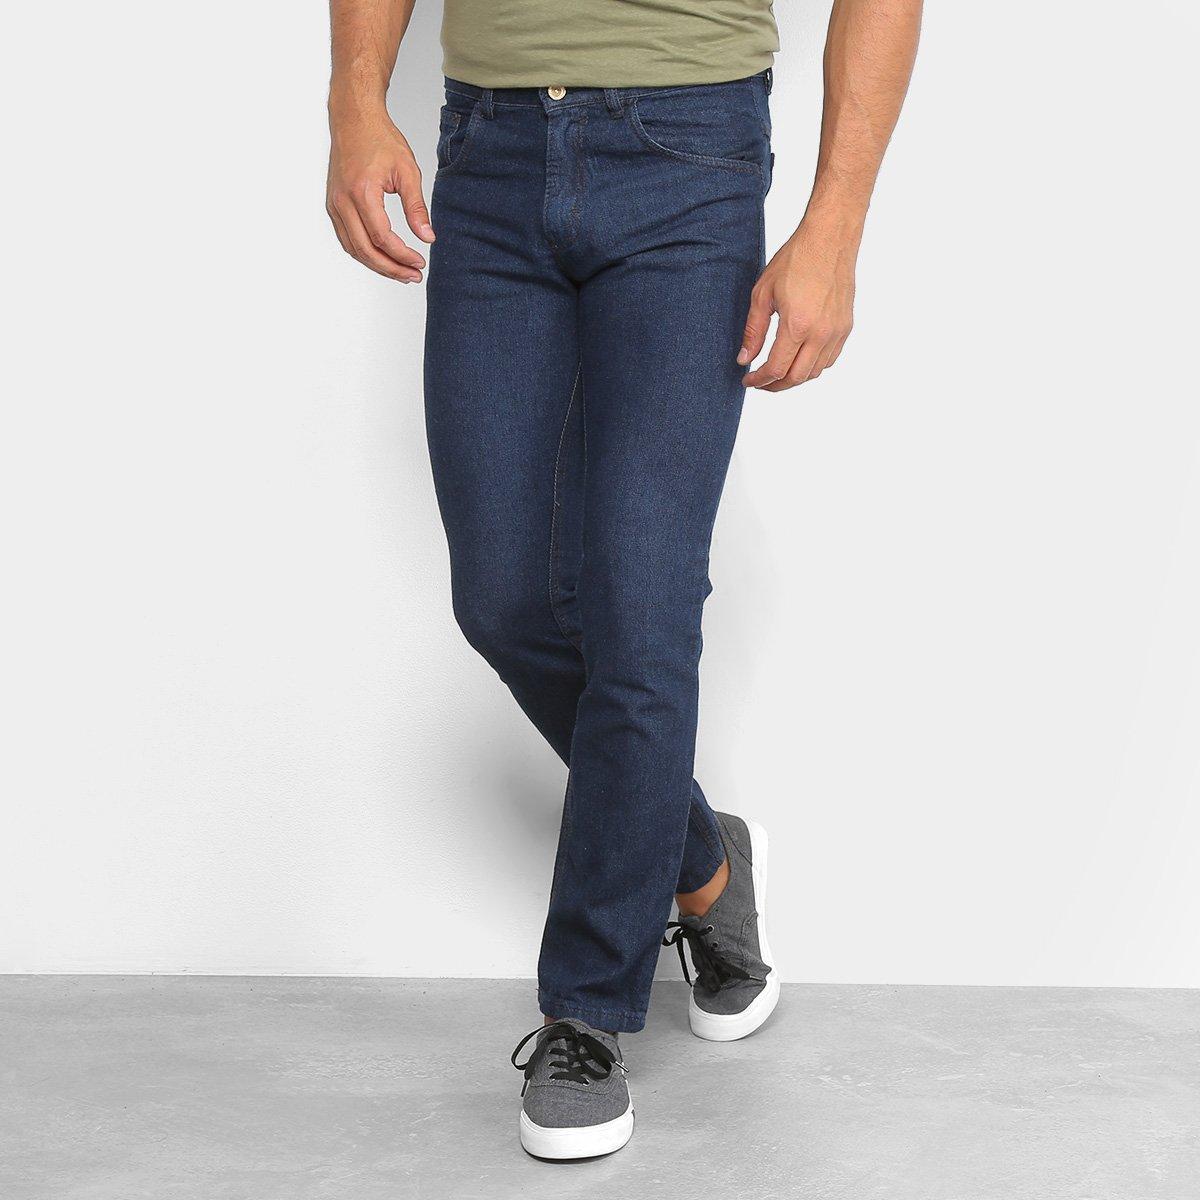 Calça Jeans Slim Rock Blue Básica Tradicional Masculina - Jeans ... 46455c4027f